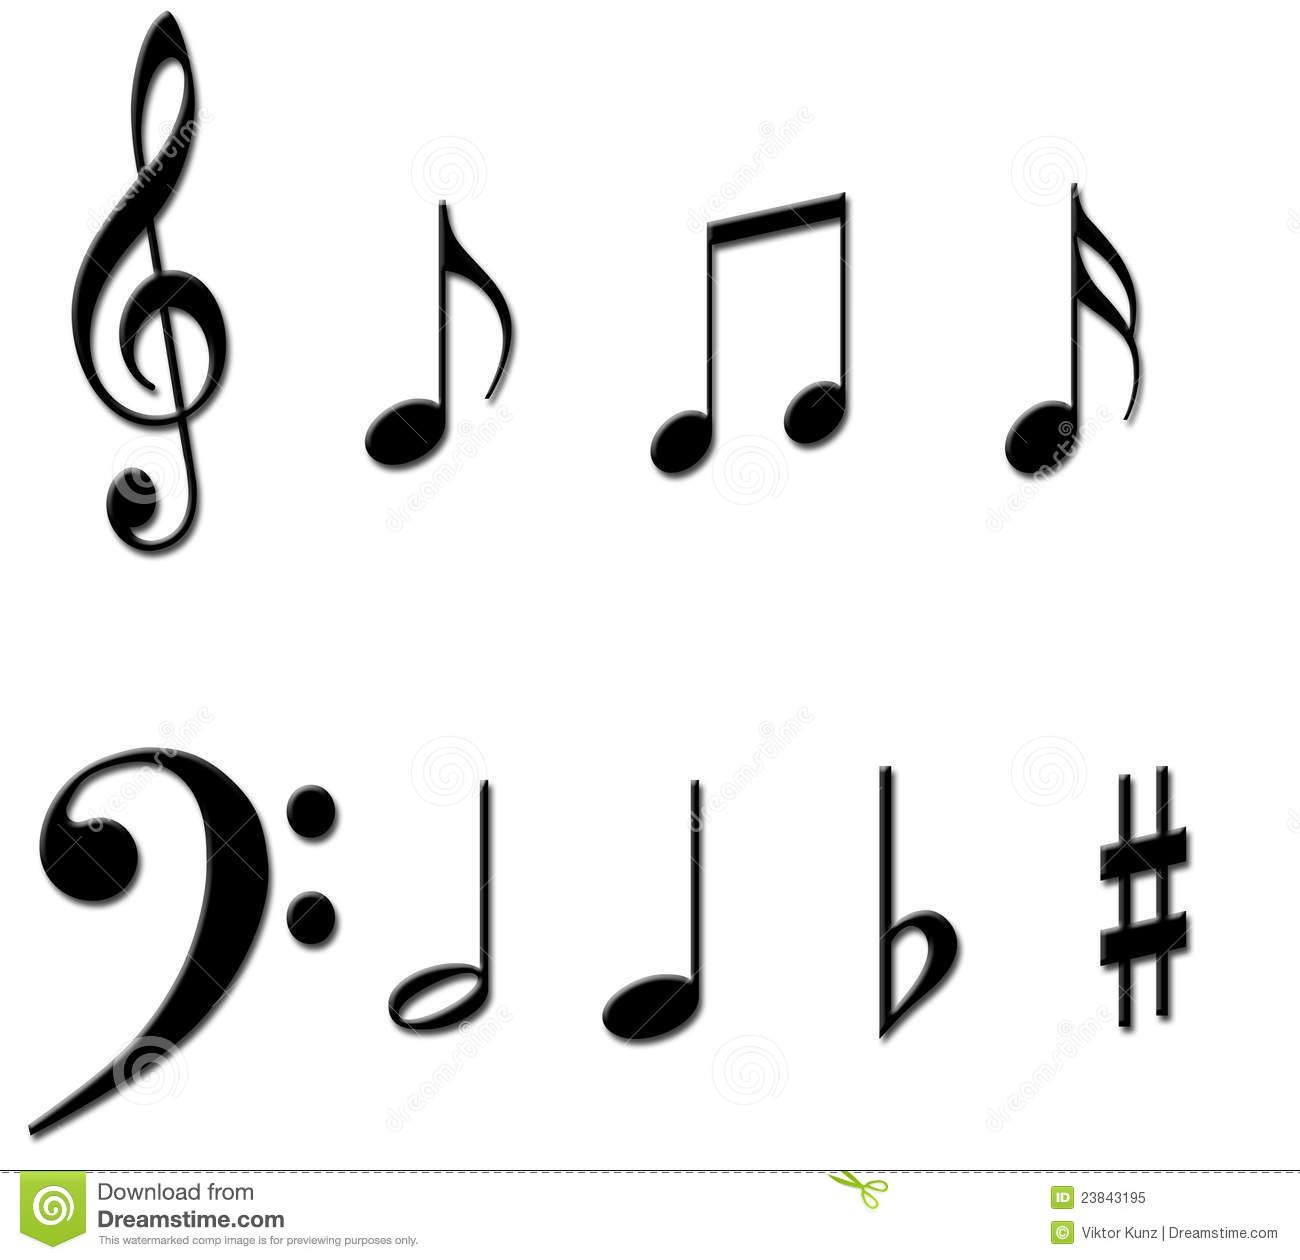 Music notes symbols 23843195g 13001260 clipart fonts music notes symbols 23843195g 13001260 buycottarizona